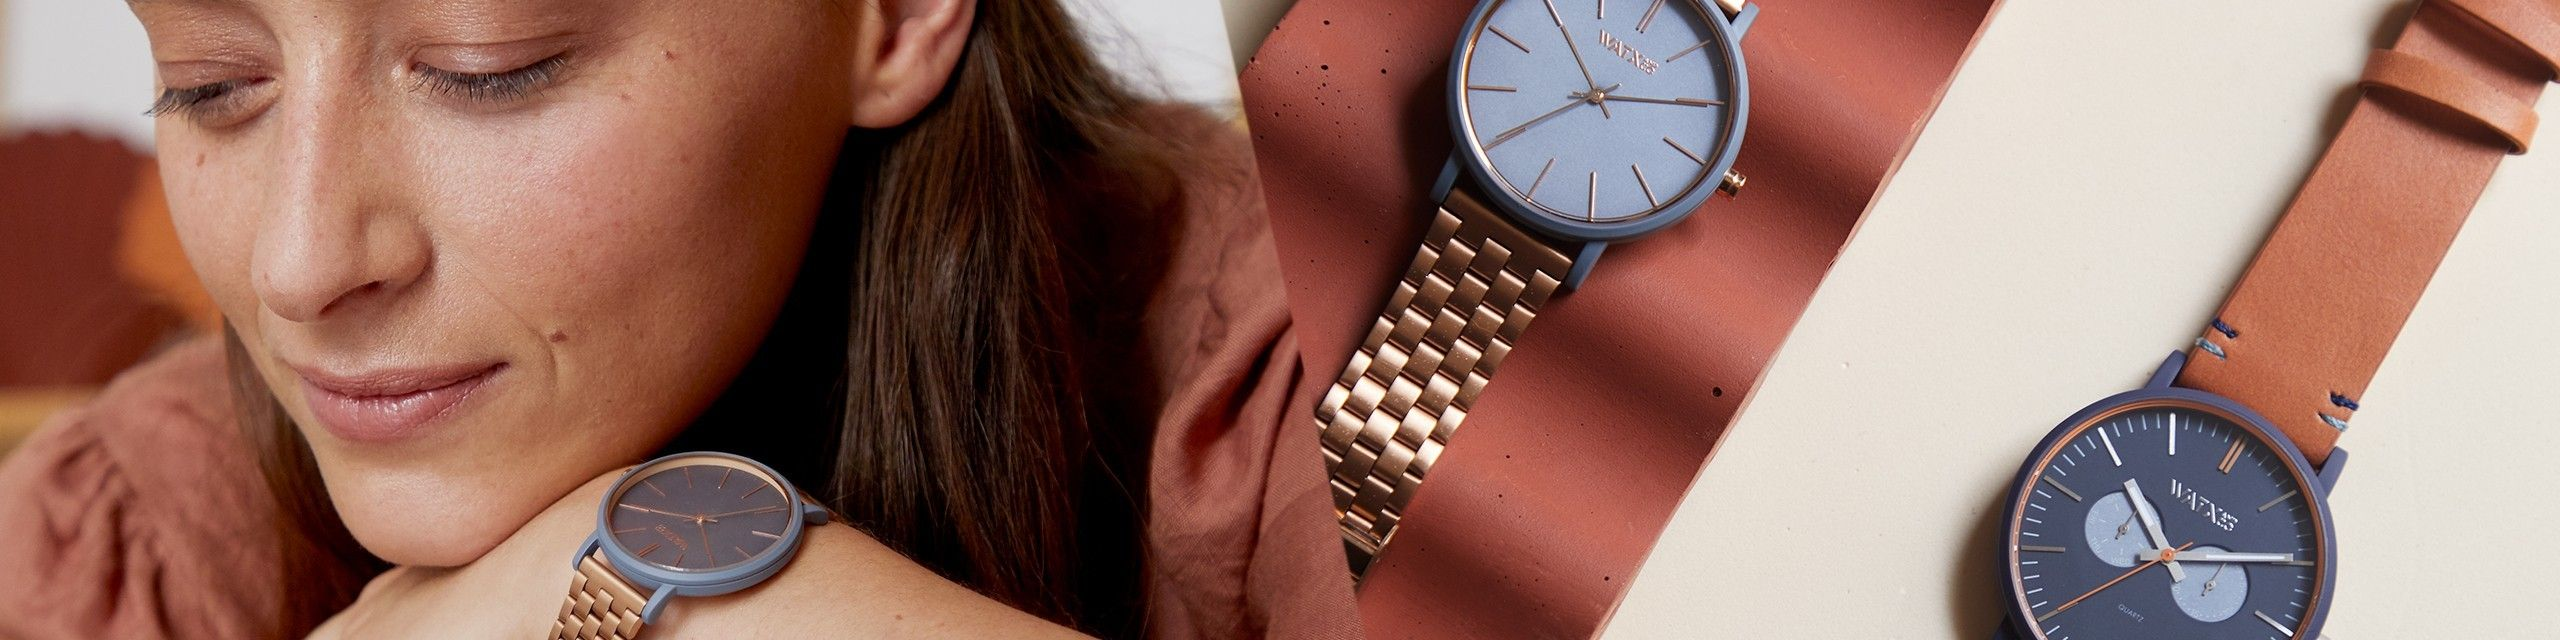 Loja online de relógios metálicos para mulher - Watx Portugal